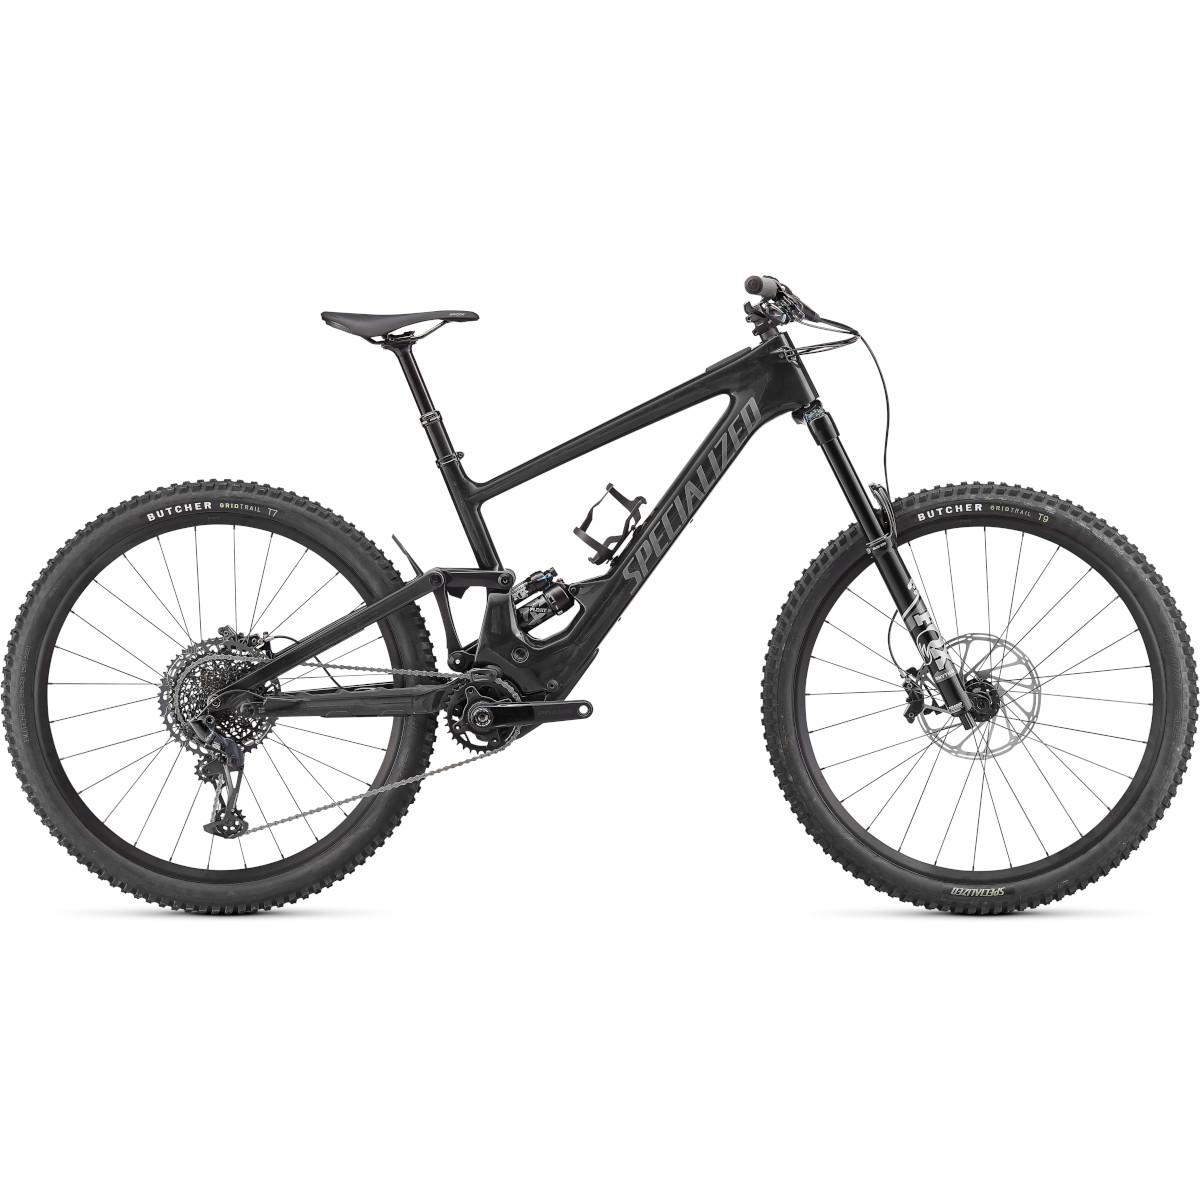 "Produktbild von Specialized TURBO KENEVO SL COMP - 29"" Carbon MTB E-Bike - 2022 - gloss smoke / dream silver"